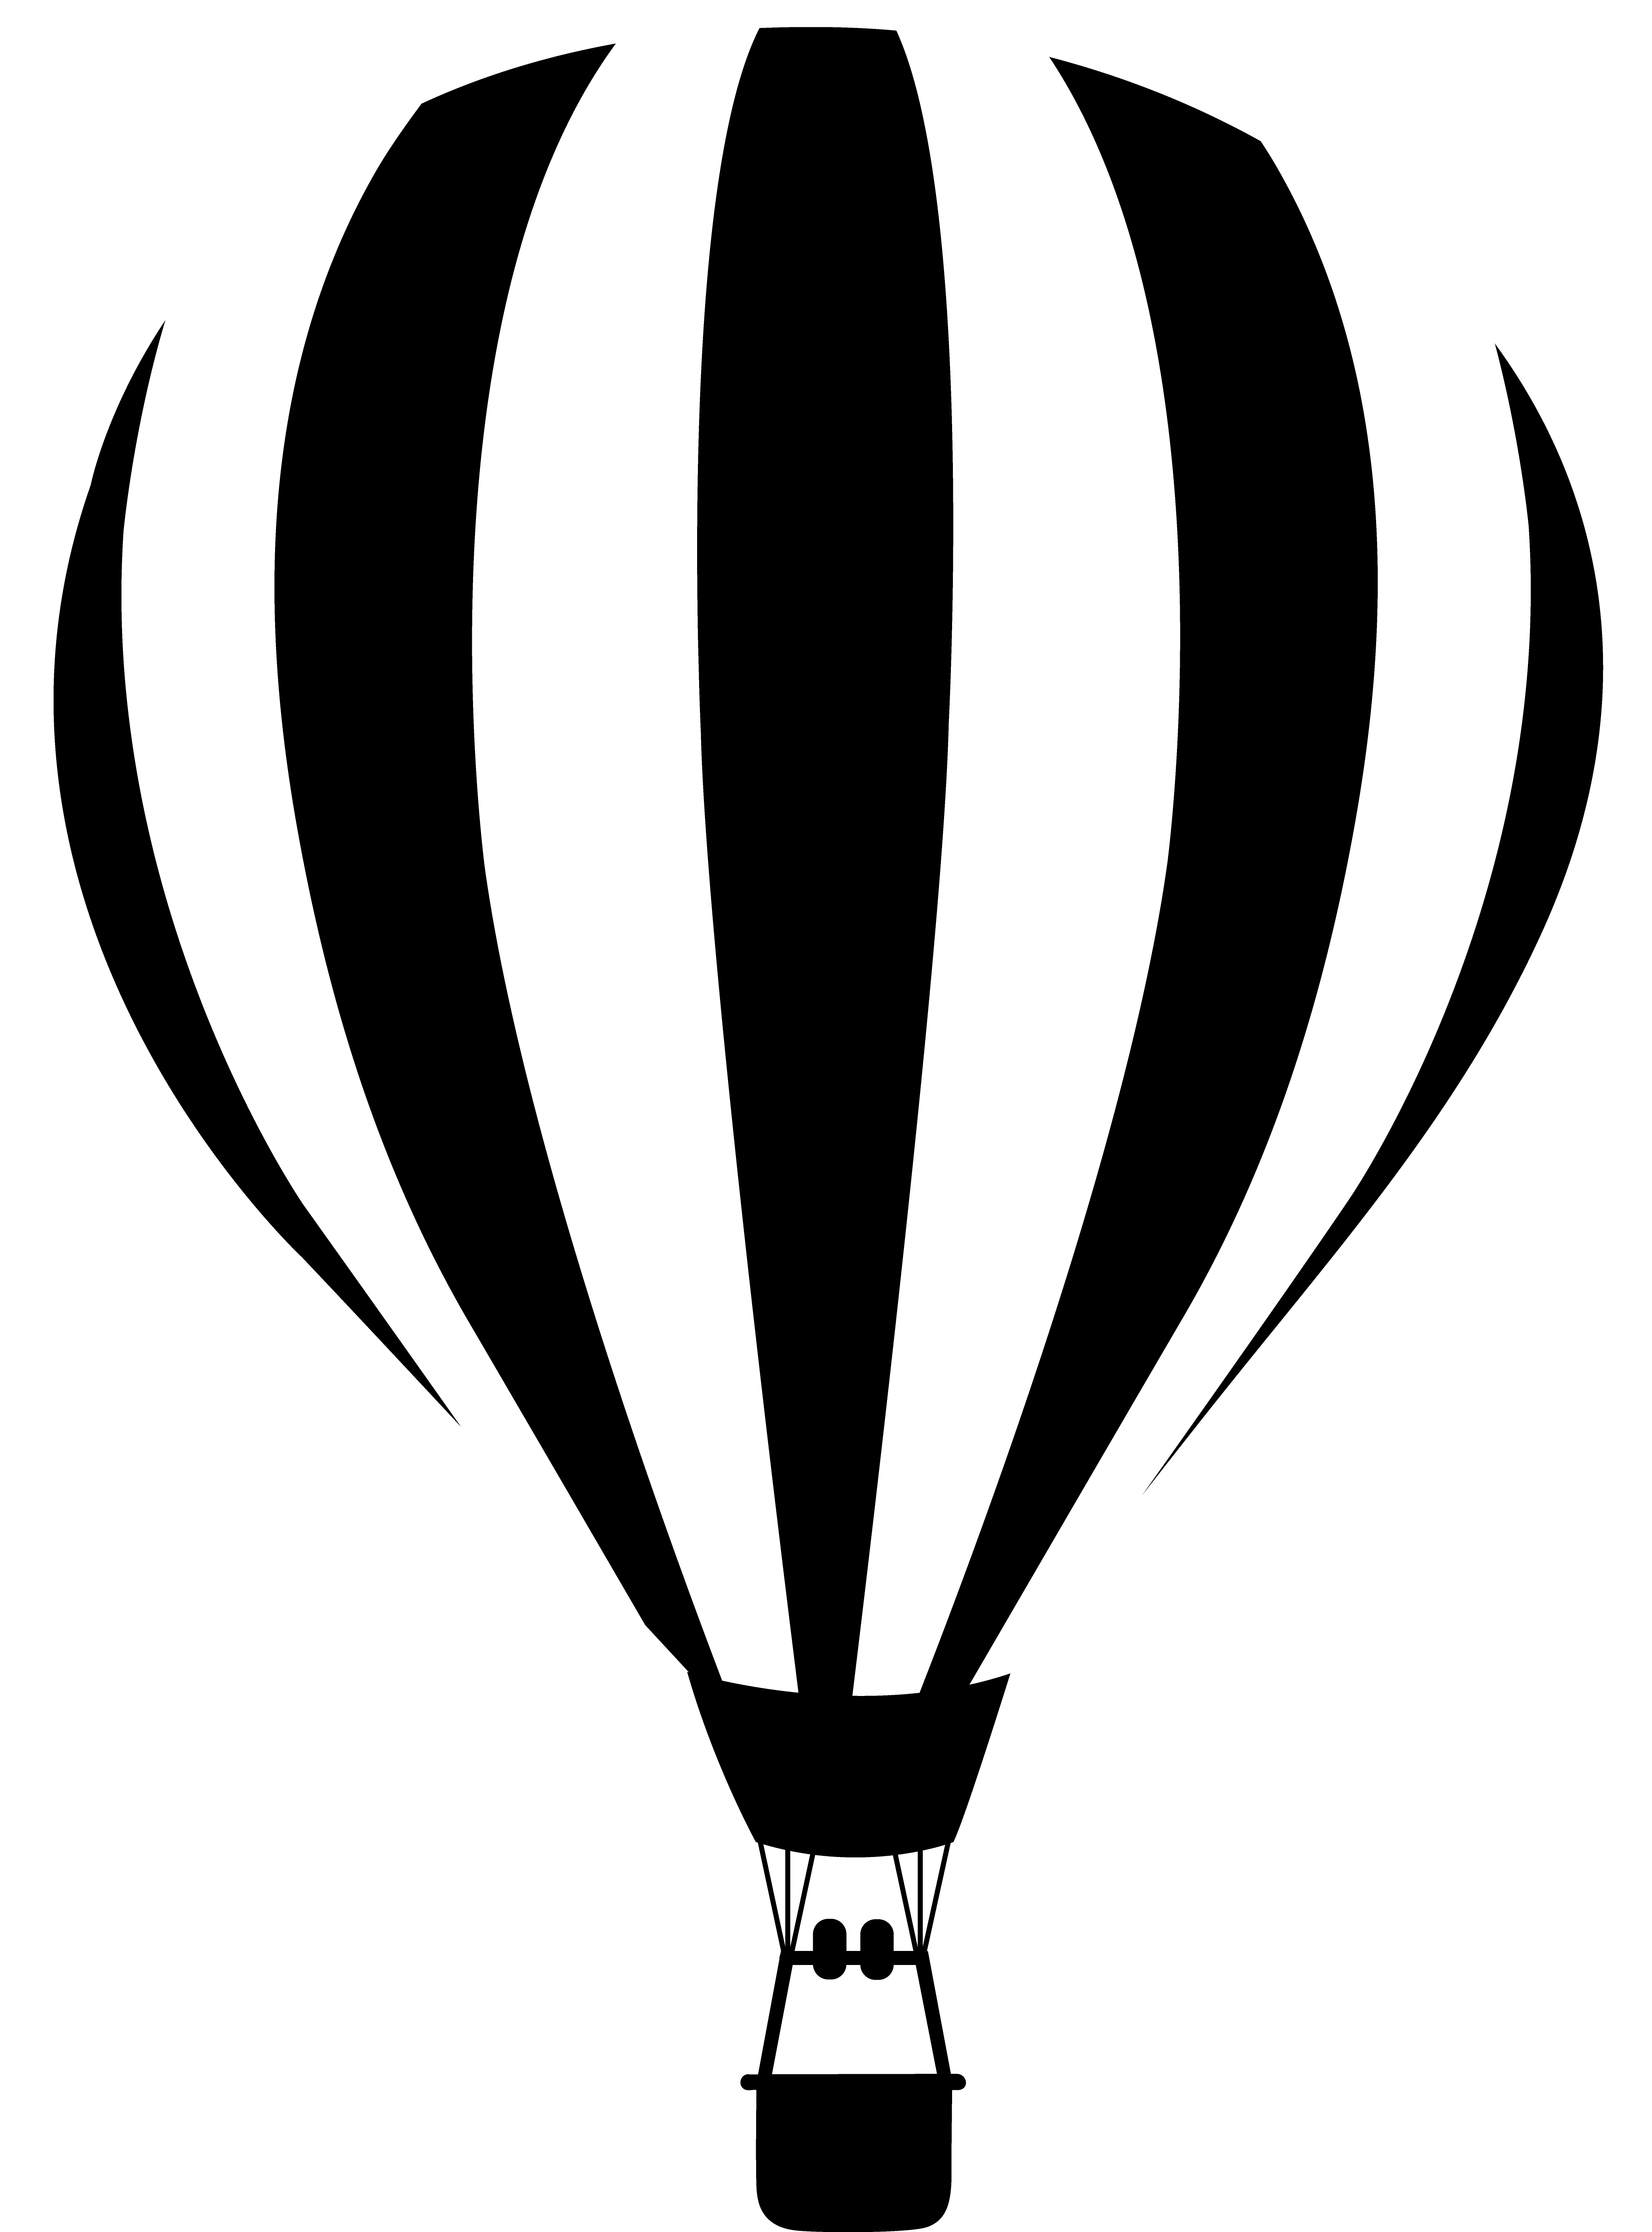 Hot Air Balloon Clip Art Black And White N4 free image.